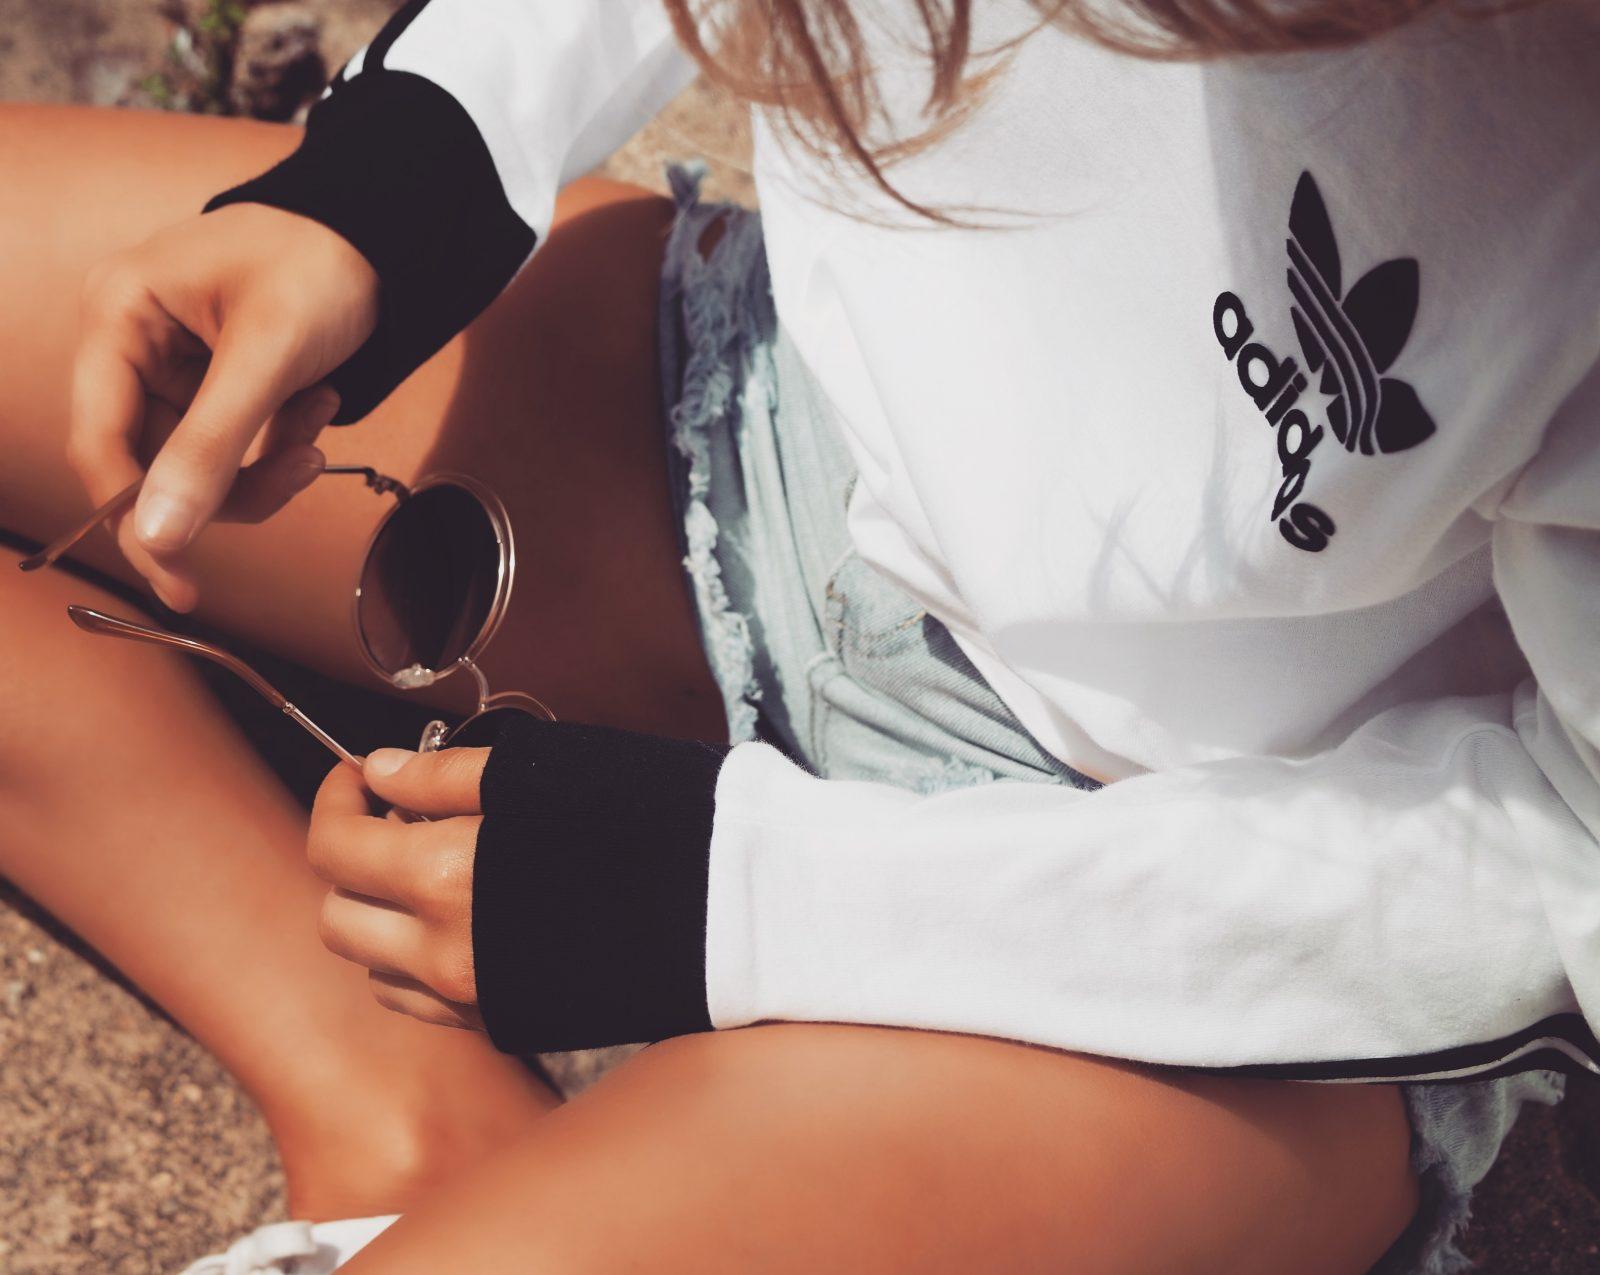 Summer BBQ Style - Adidas T-Shirt